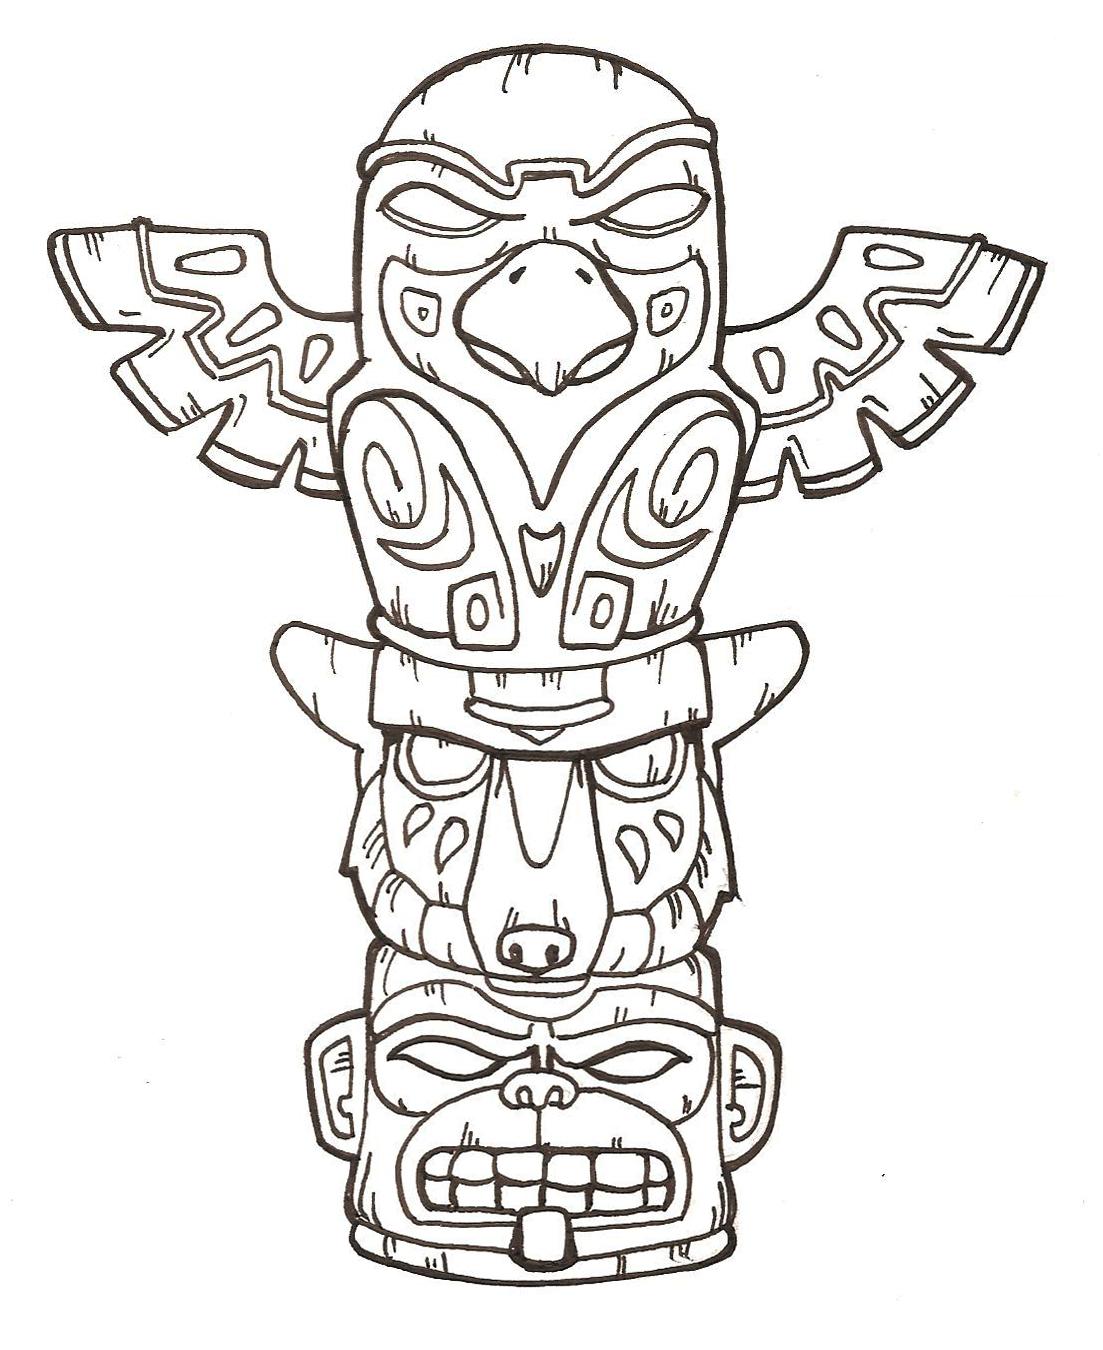 Totem Pole 2 By Flashfek4 On Deviantart